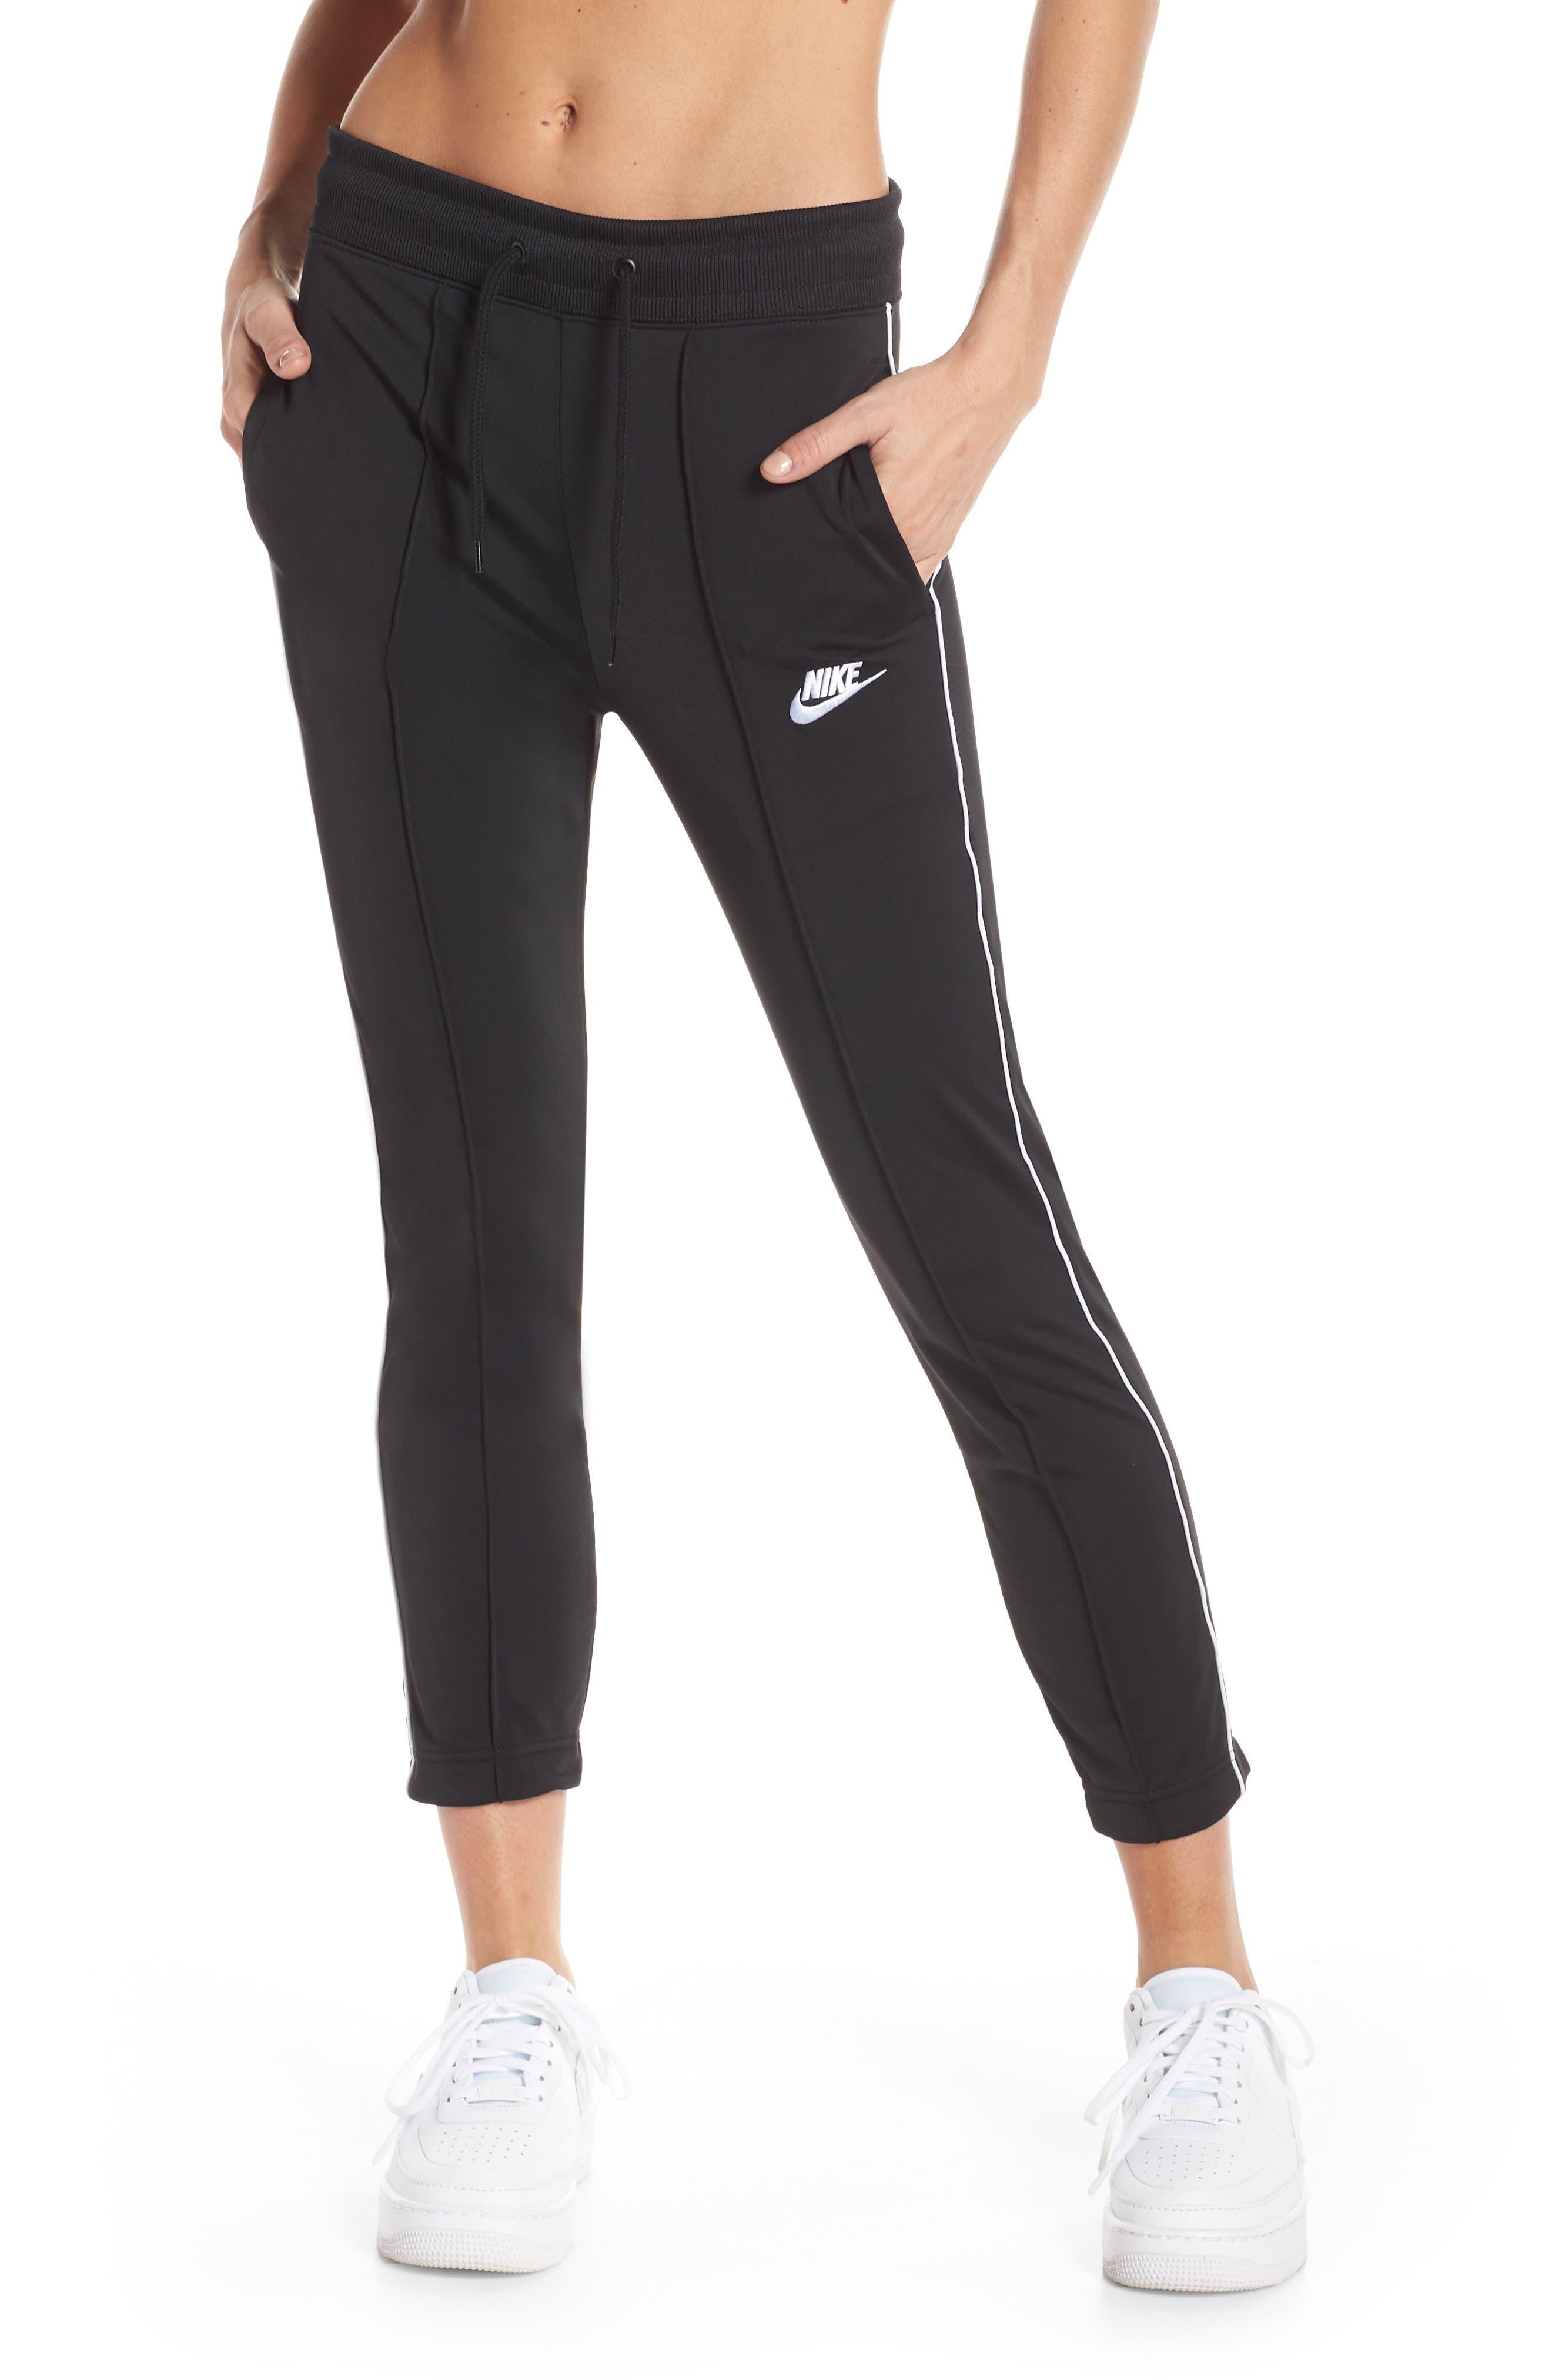 NIKE, NSW Slim Crop Pants, Main thumbnail 1, color, BLACK/ WHITE/ WHITE